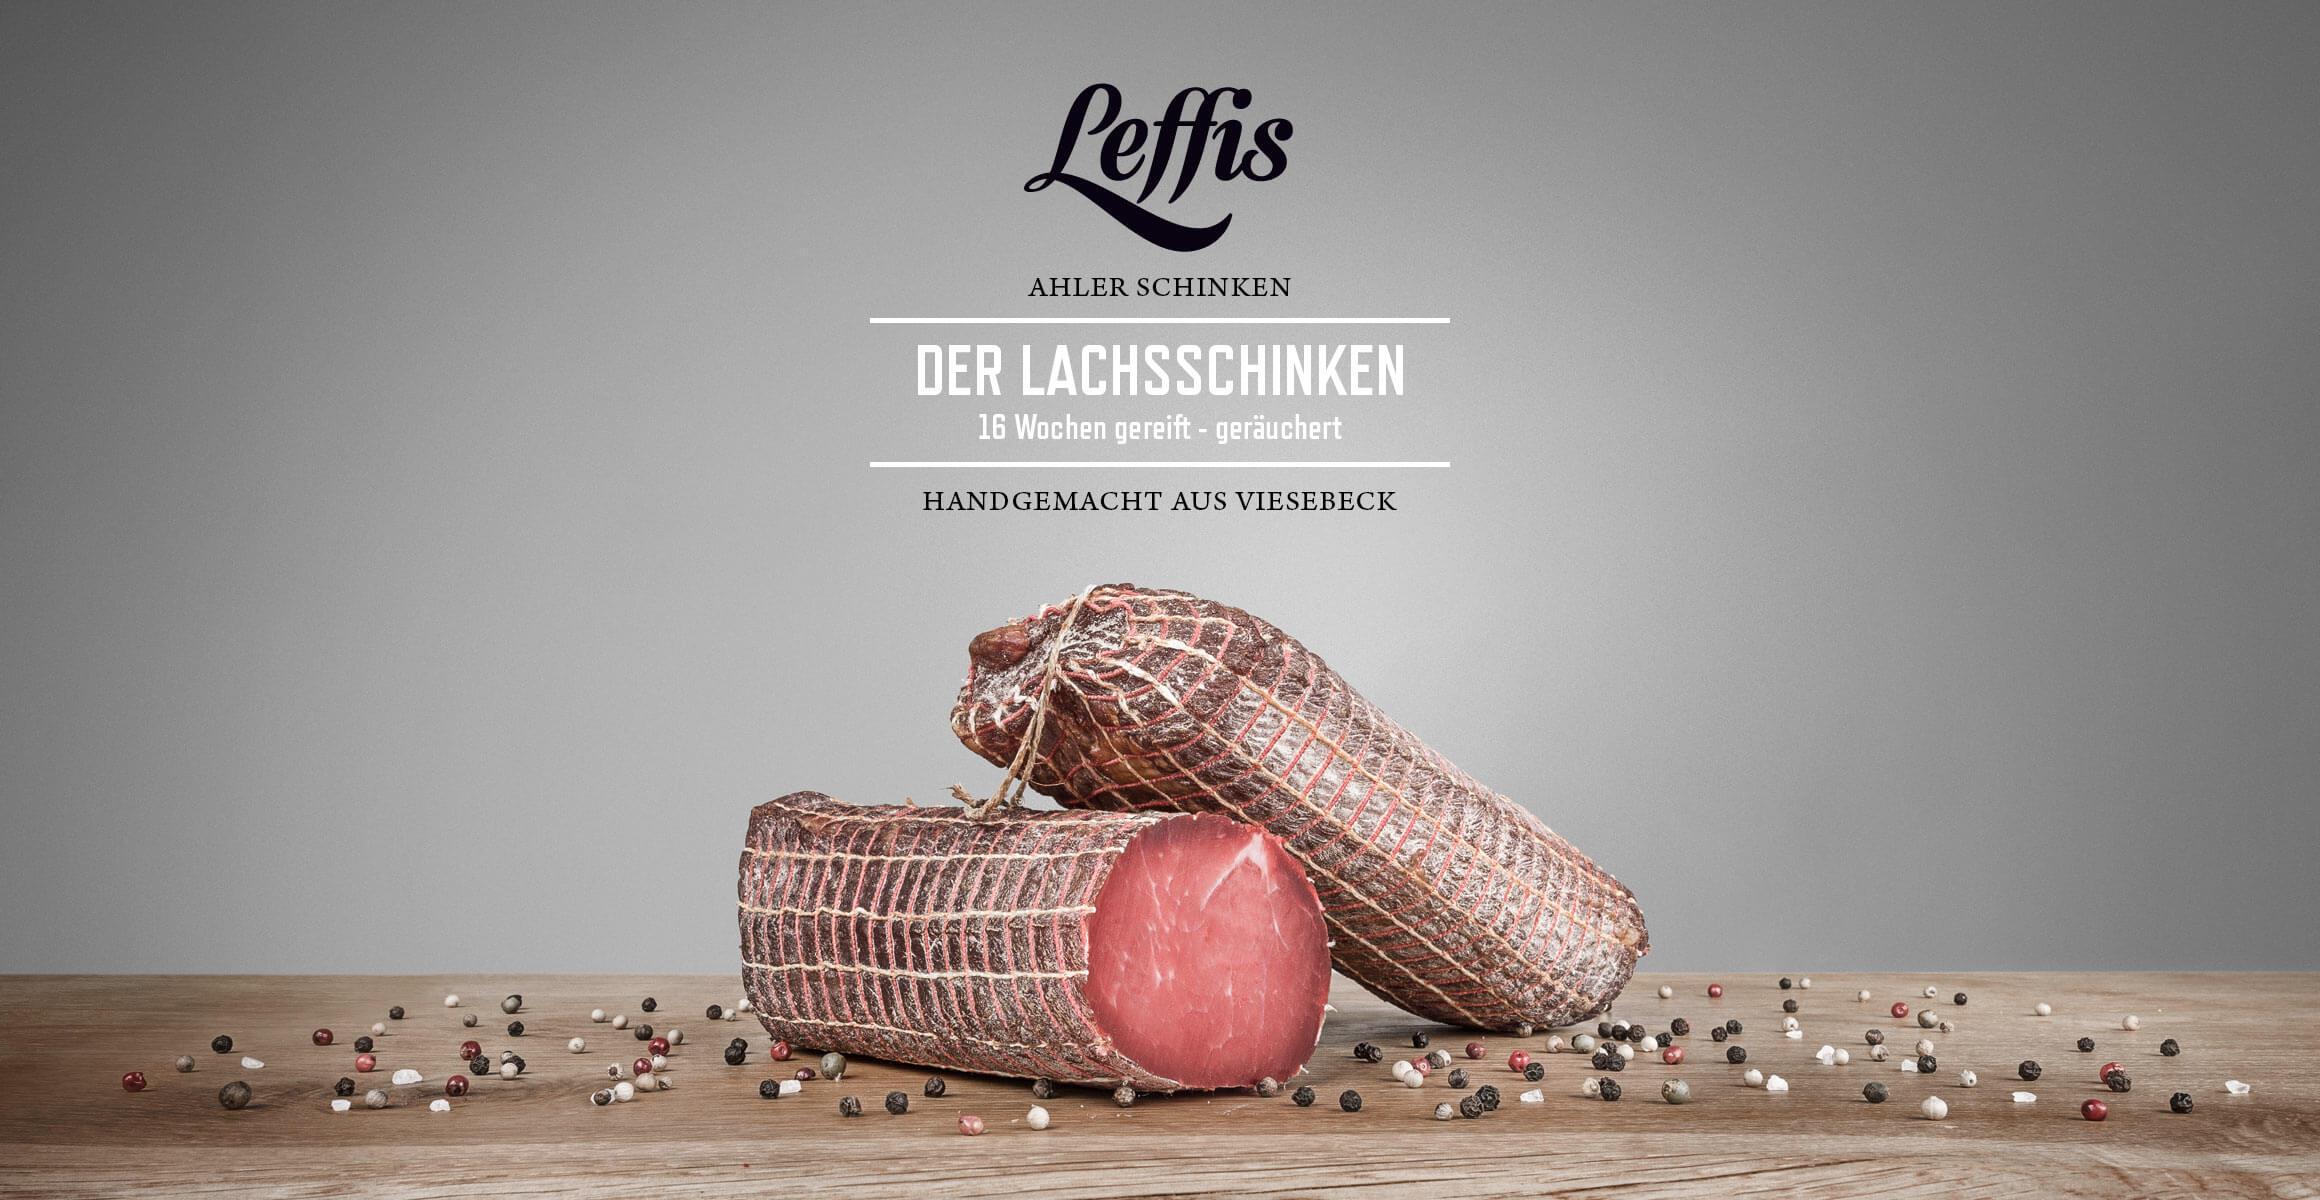 lachsschinken_ahler_schinken_leffis_image_2X